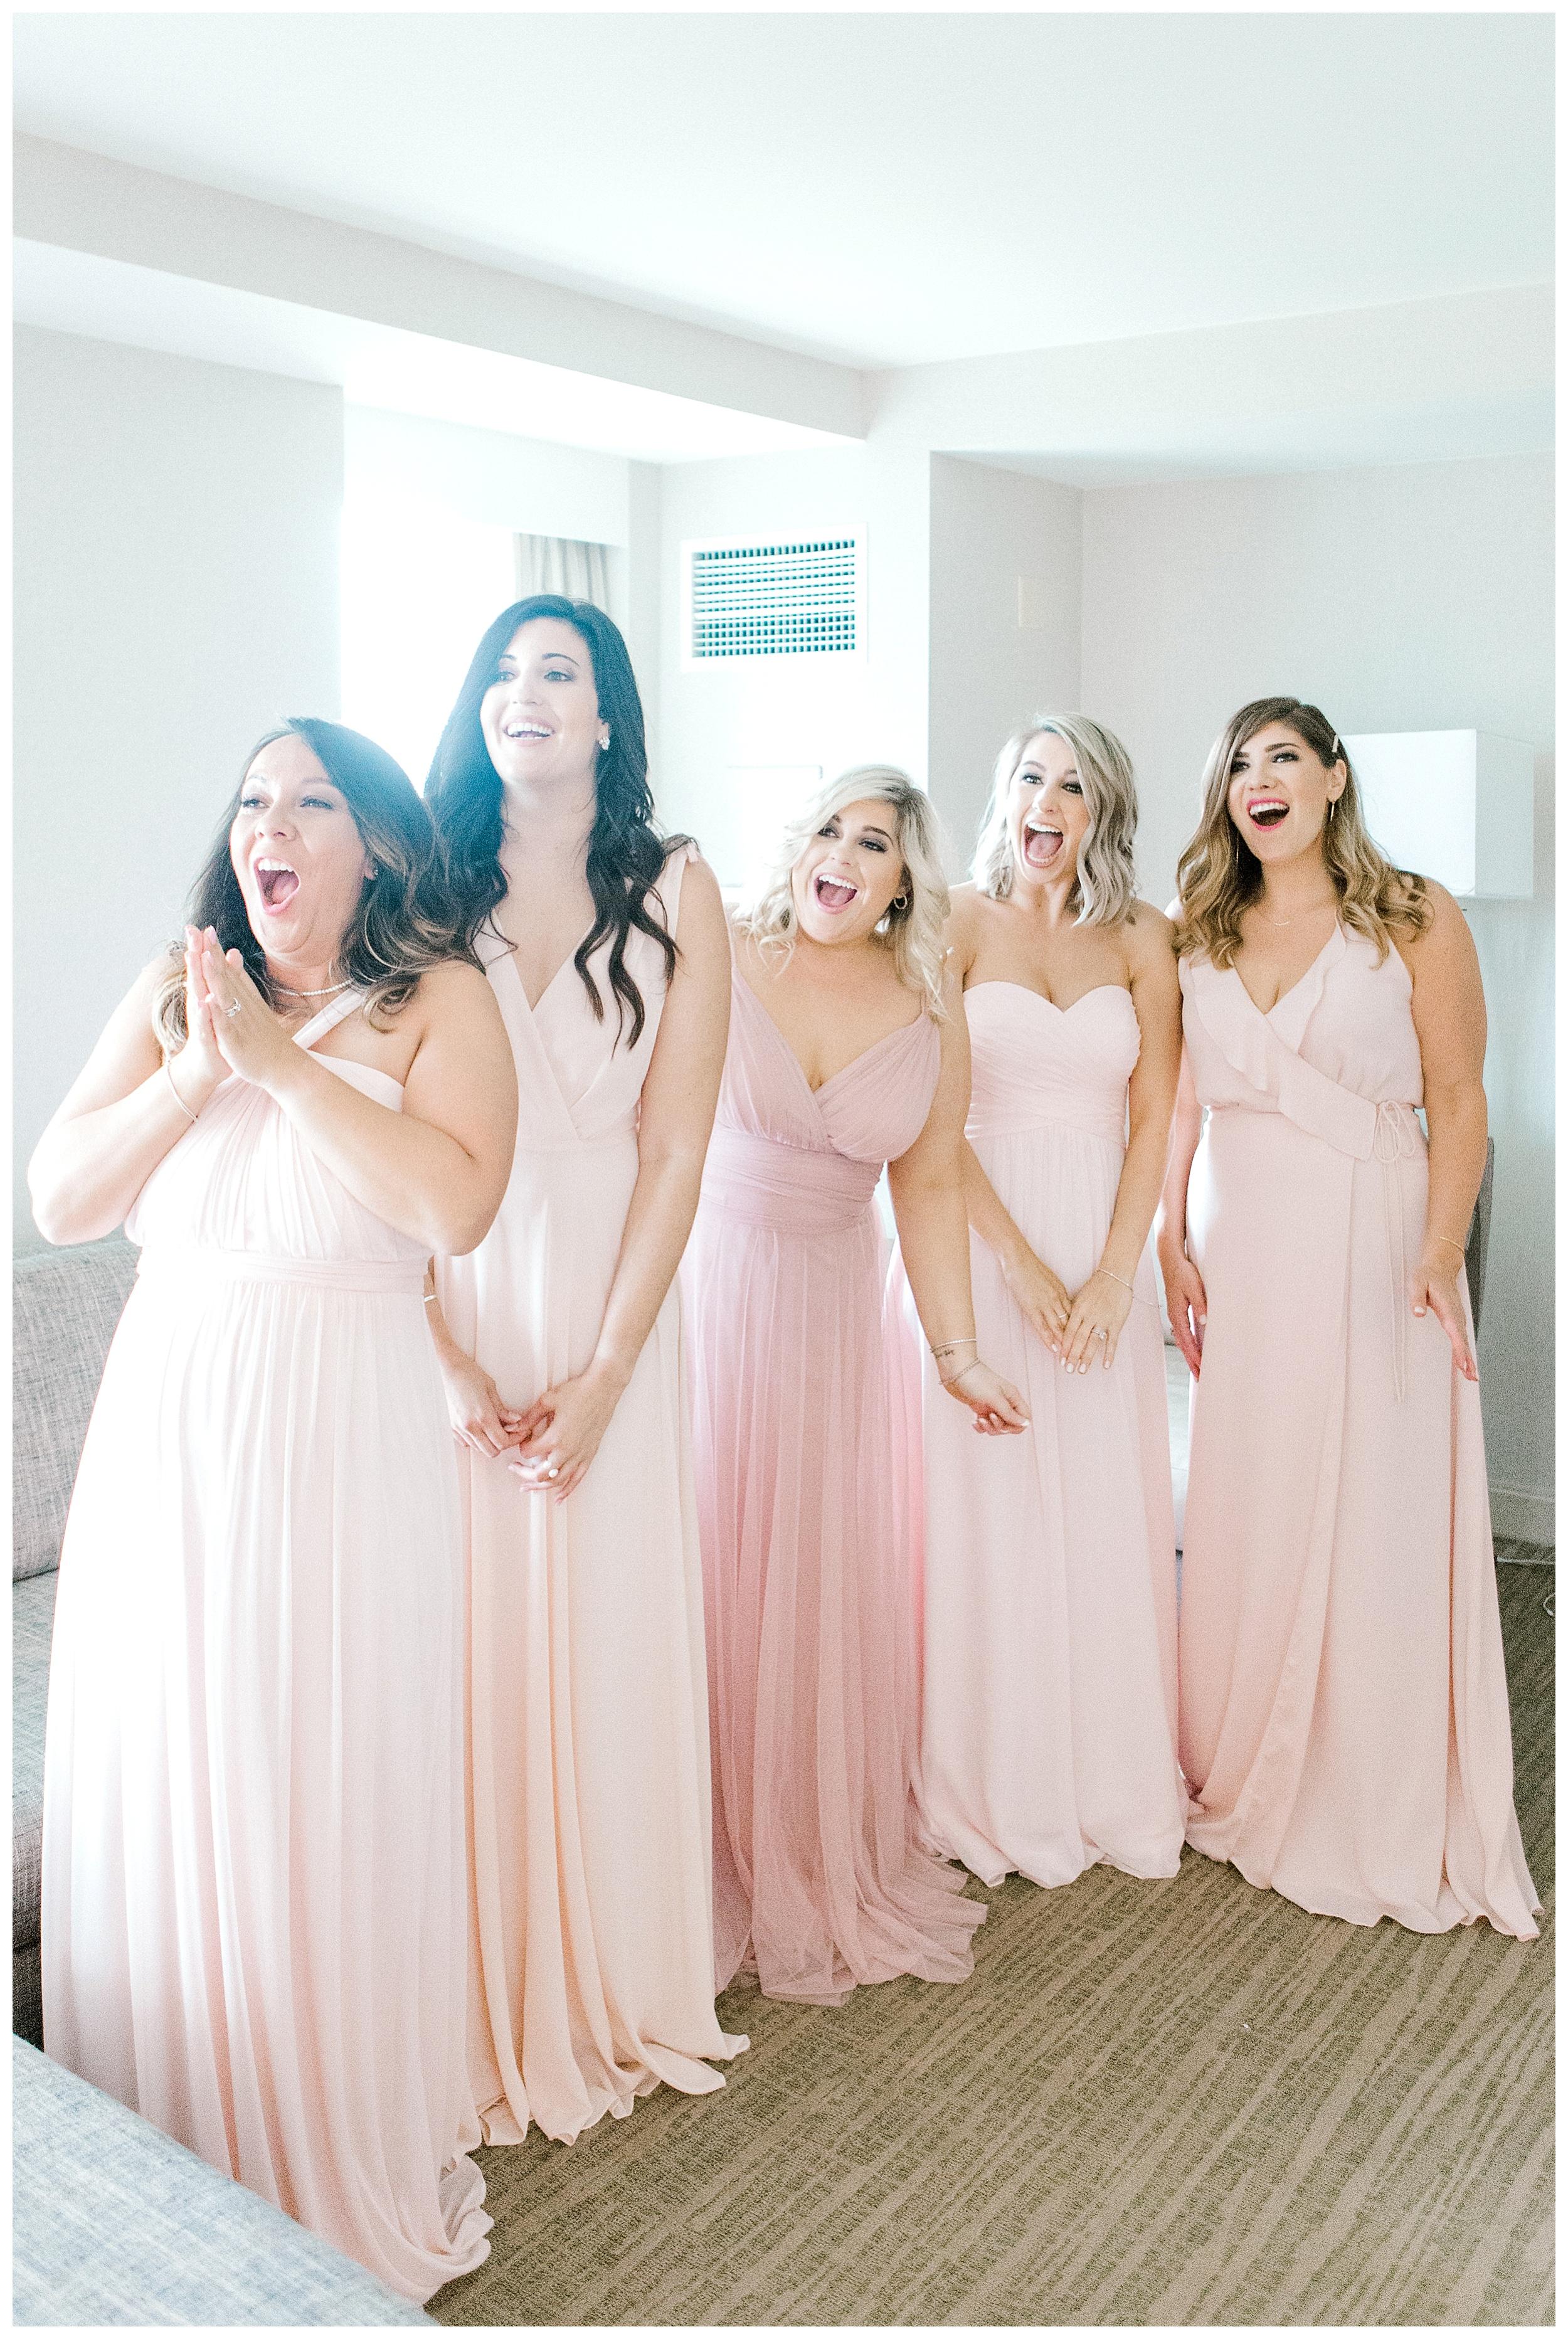 Lansdowne Resort Wedding | Virginia Film Wedding Photographer Kir Tuben_0020.jpg